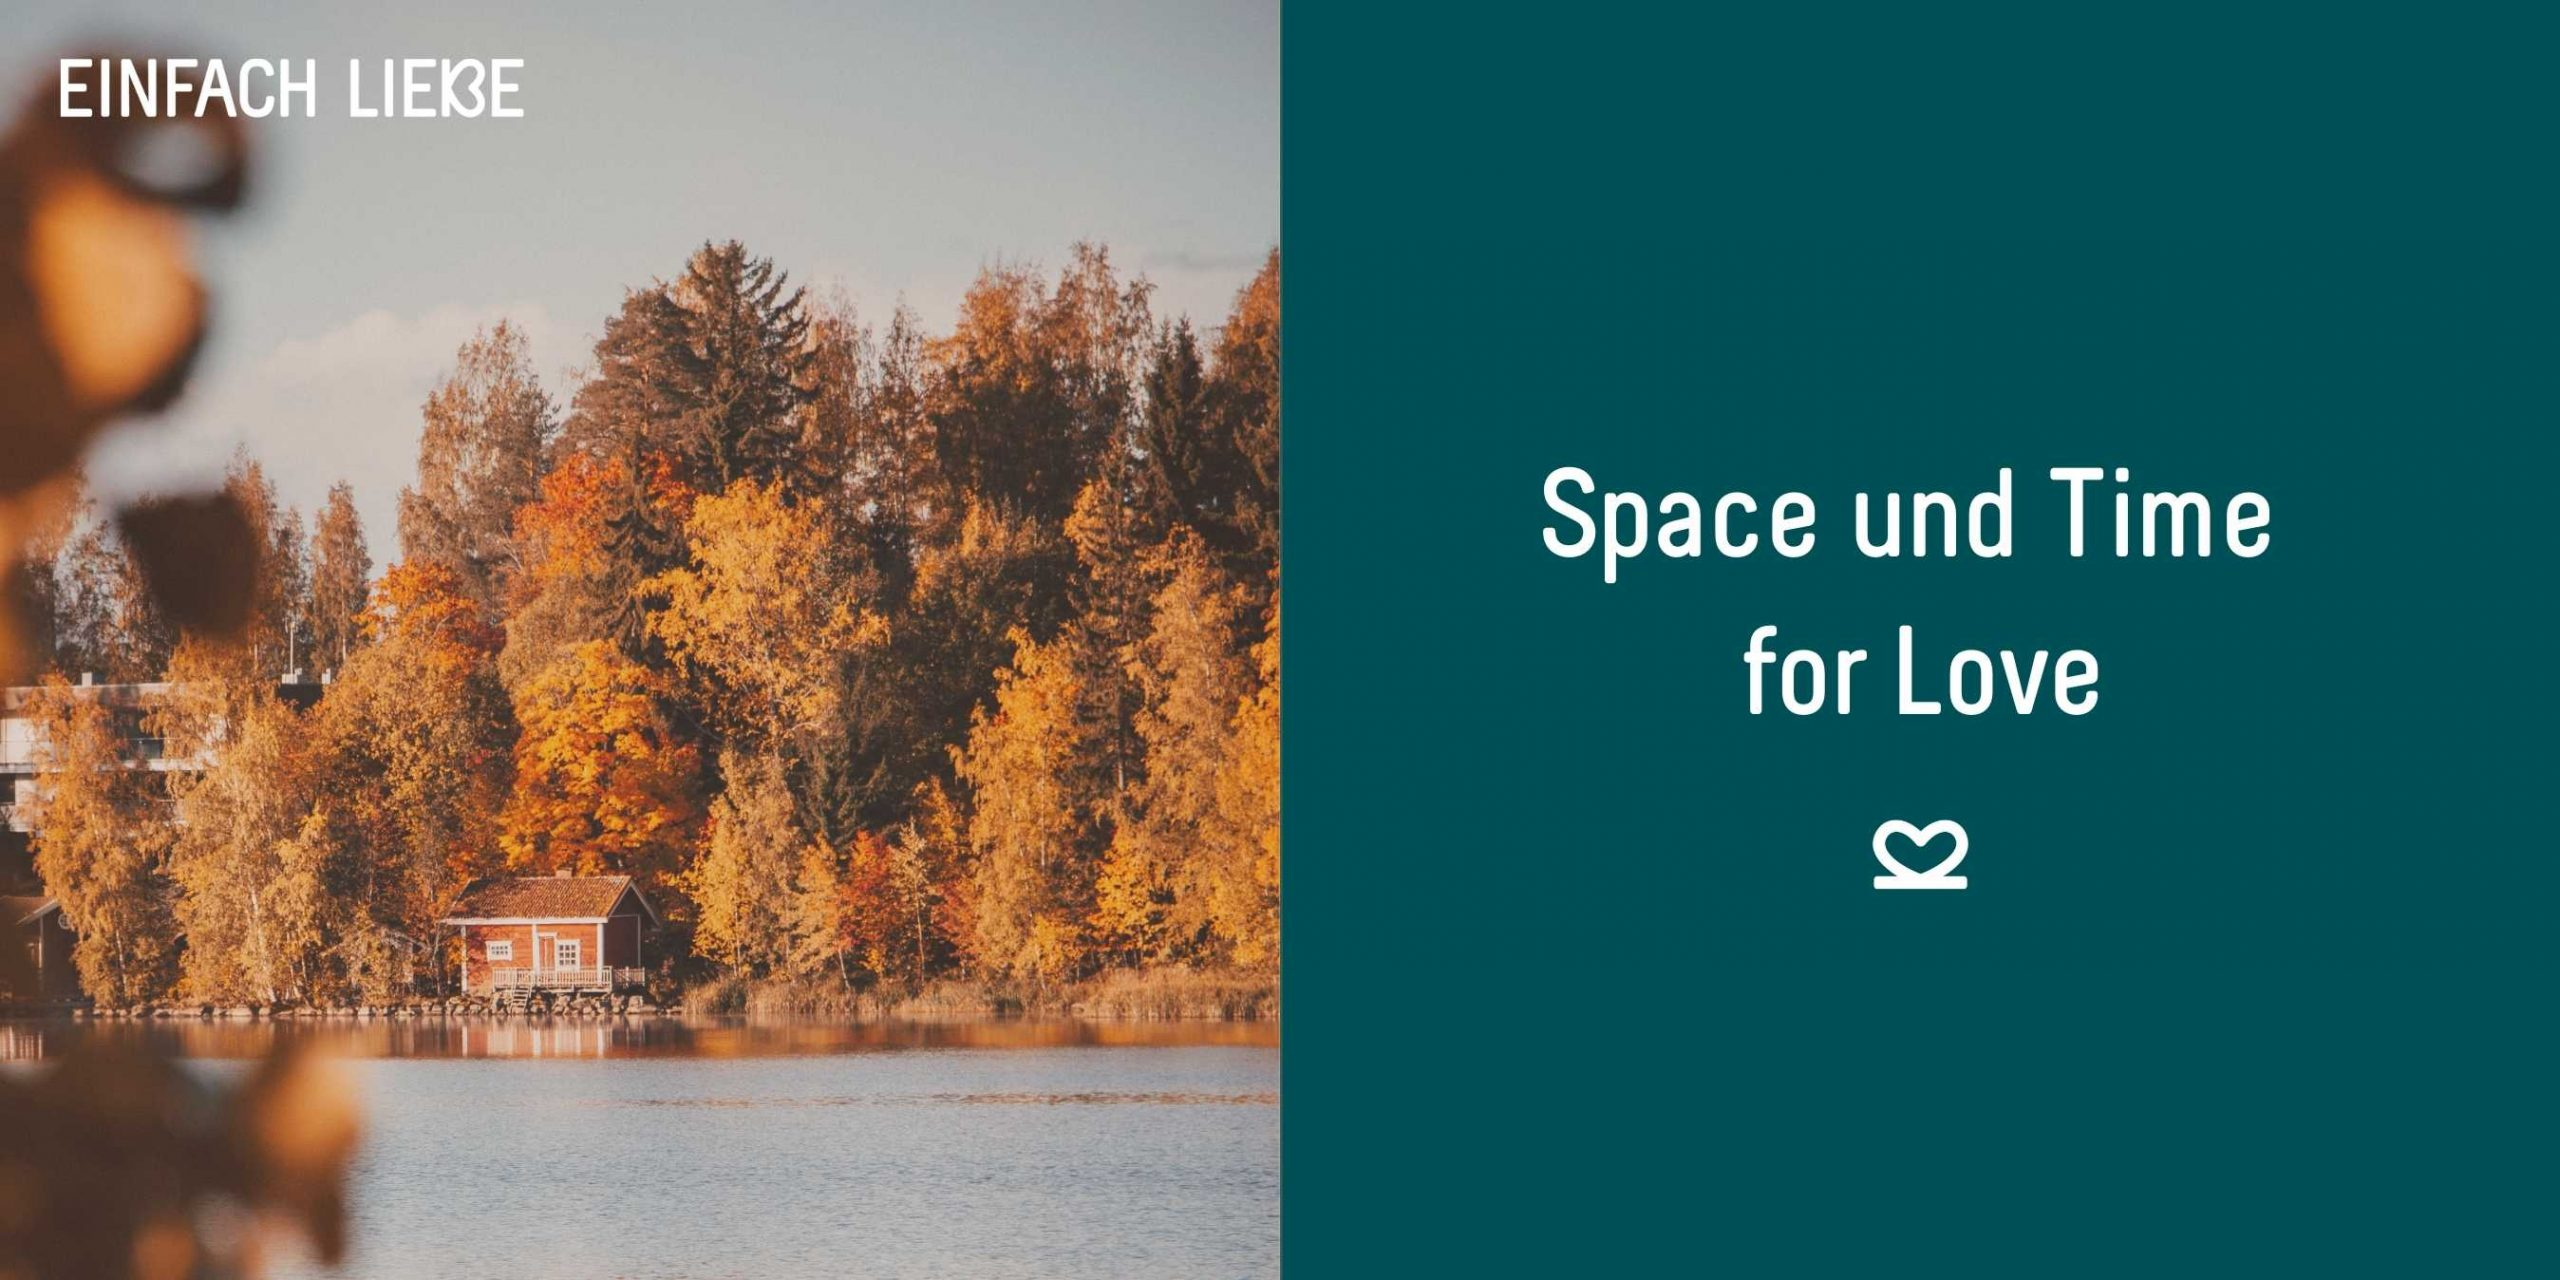 Retreat als Space und Time for Love